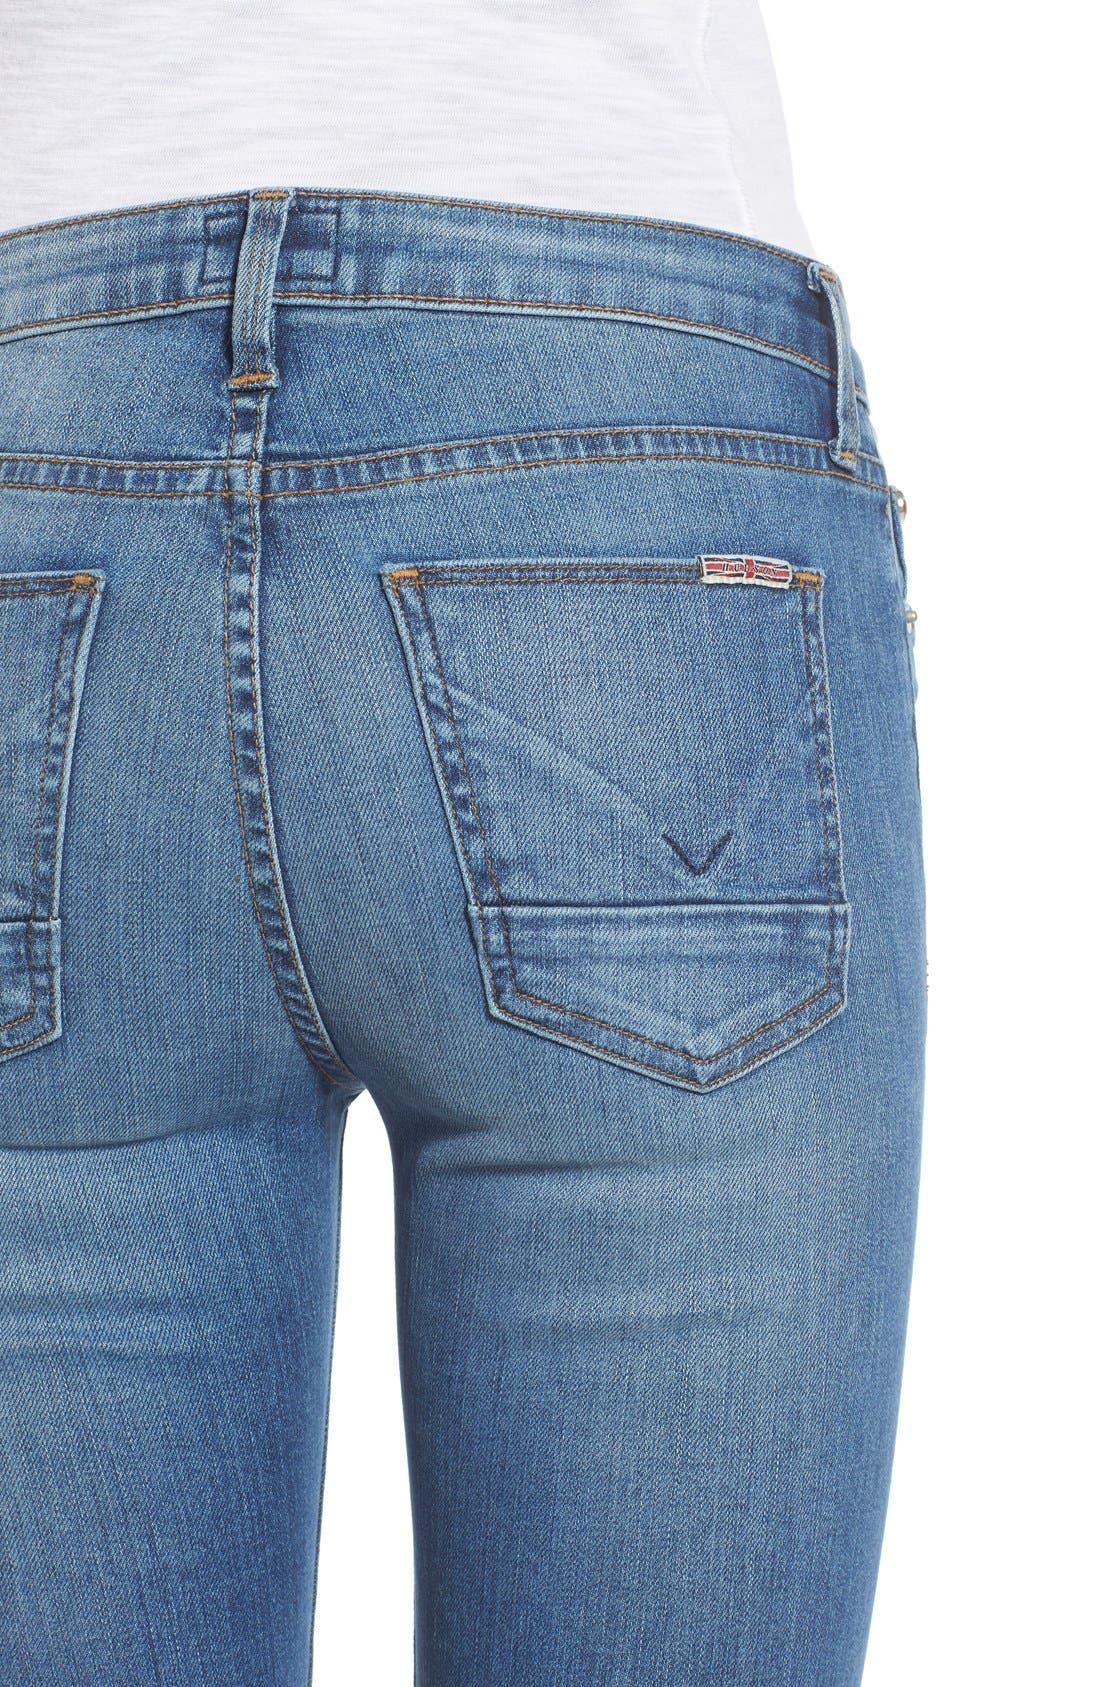 Alternate Image 4  - Hudson Jeans 'Mia' Raw Hem Crop Flare Jeans (Carve)